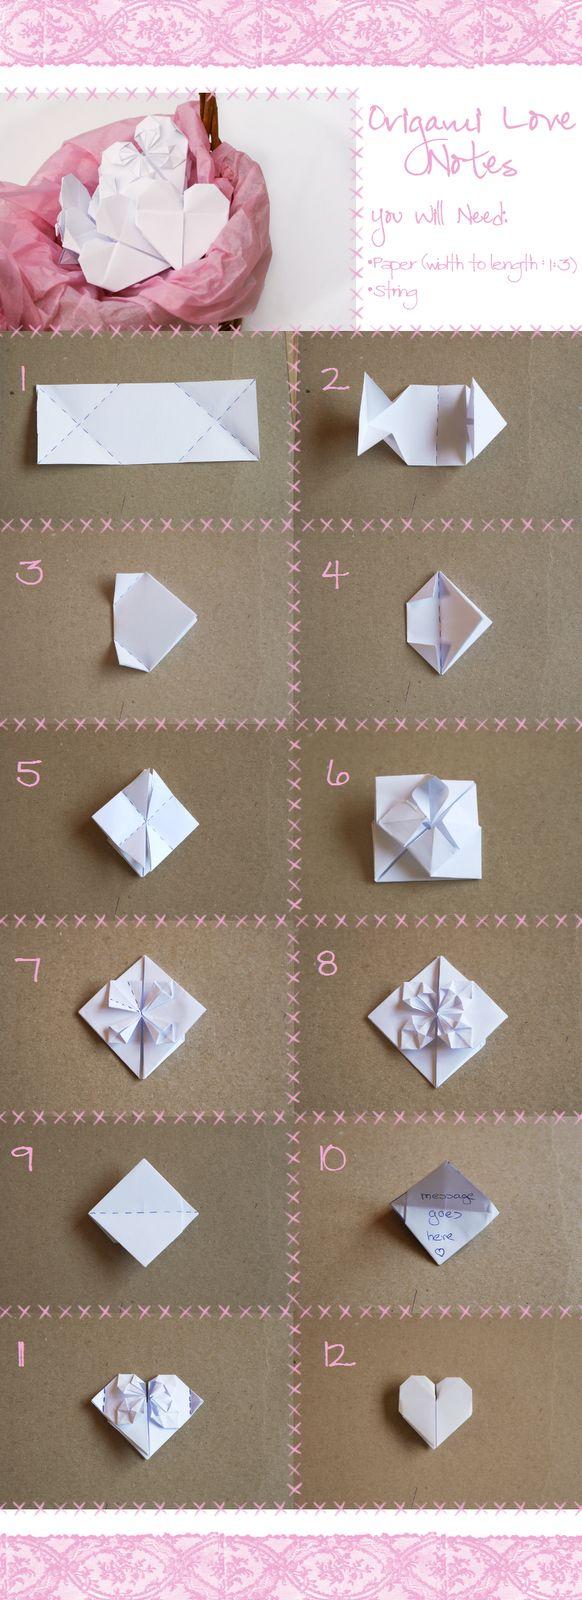 Origami Love Note Tutorial